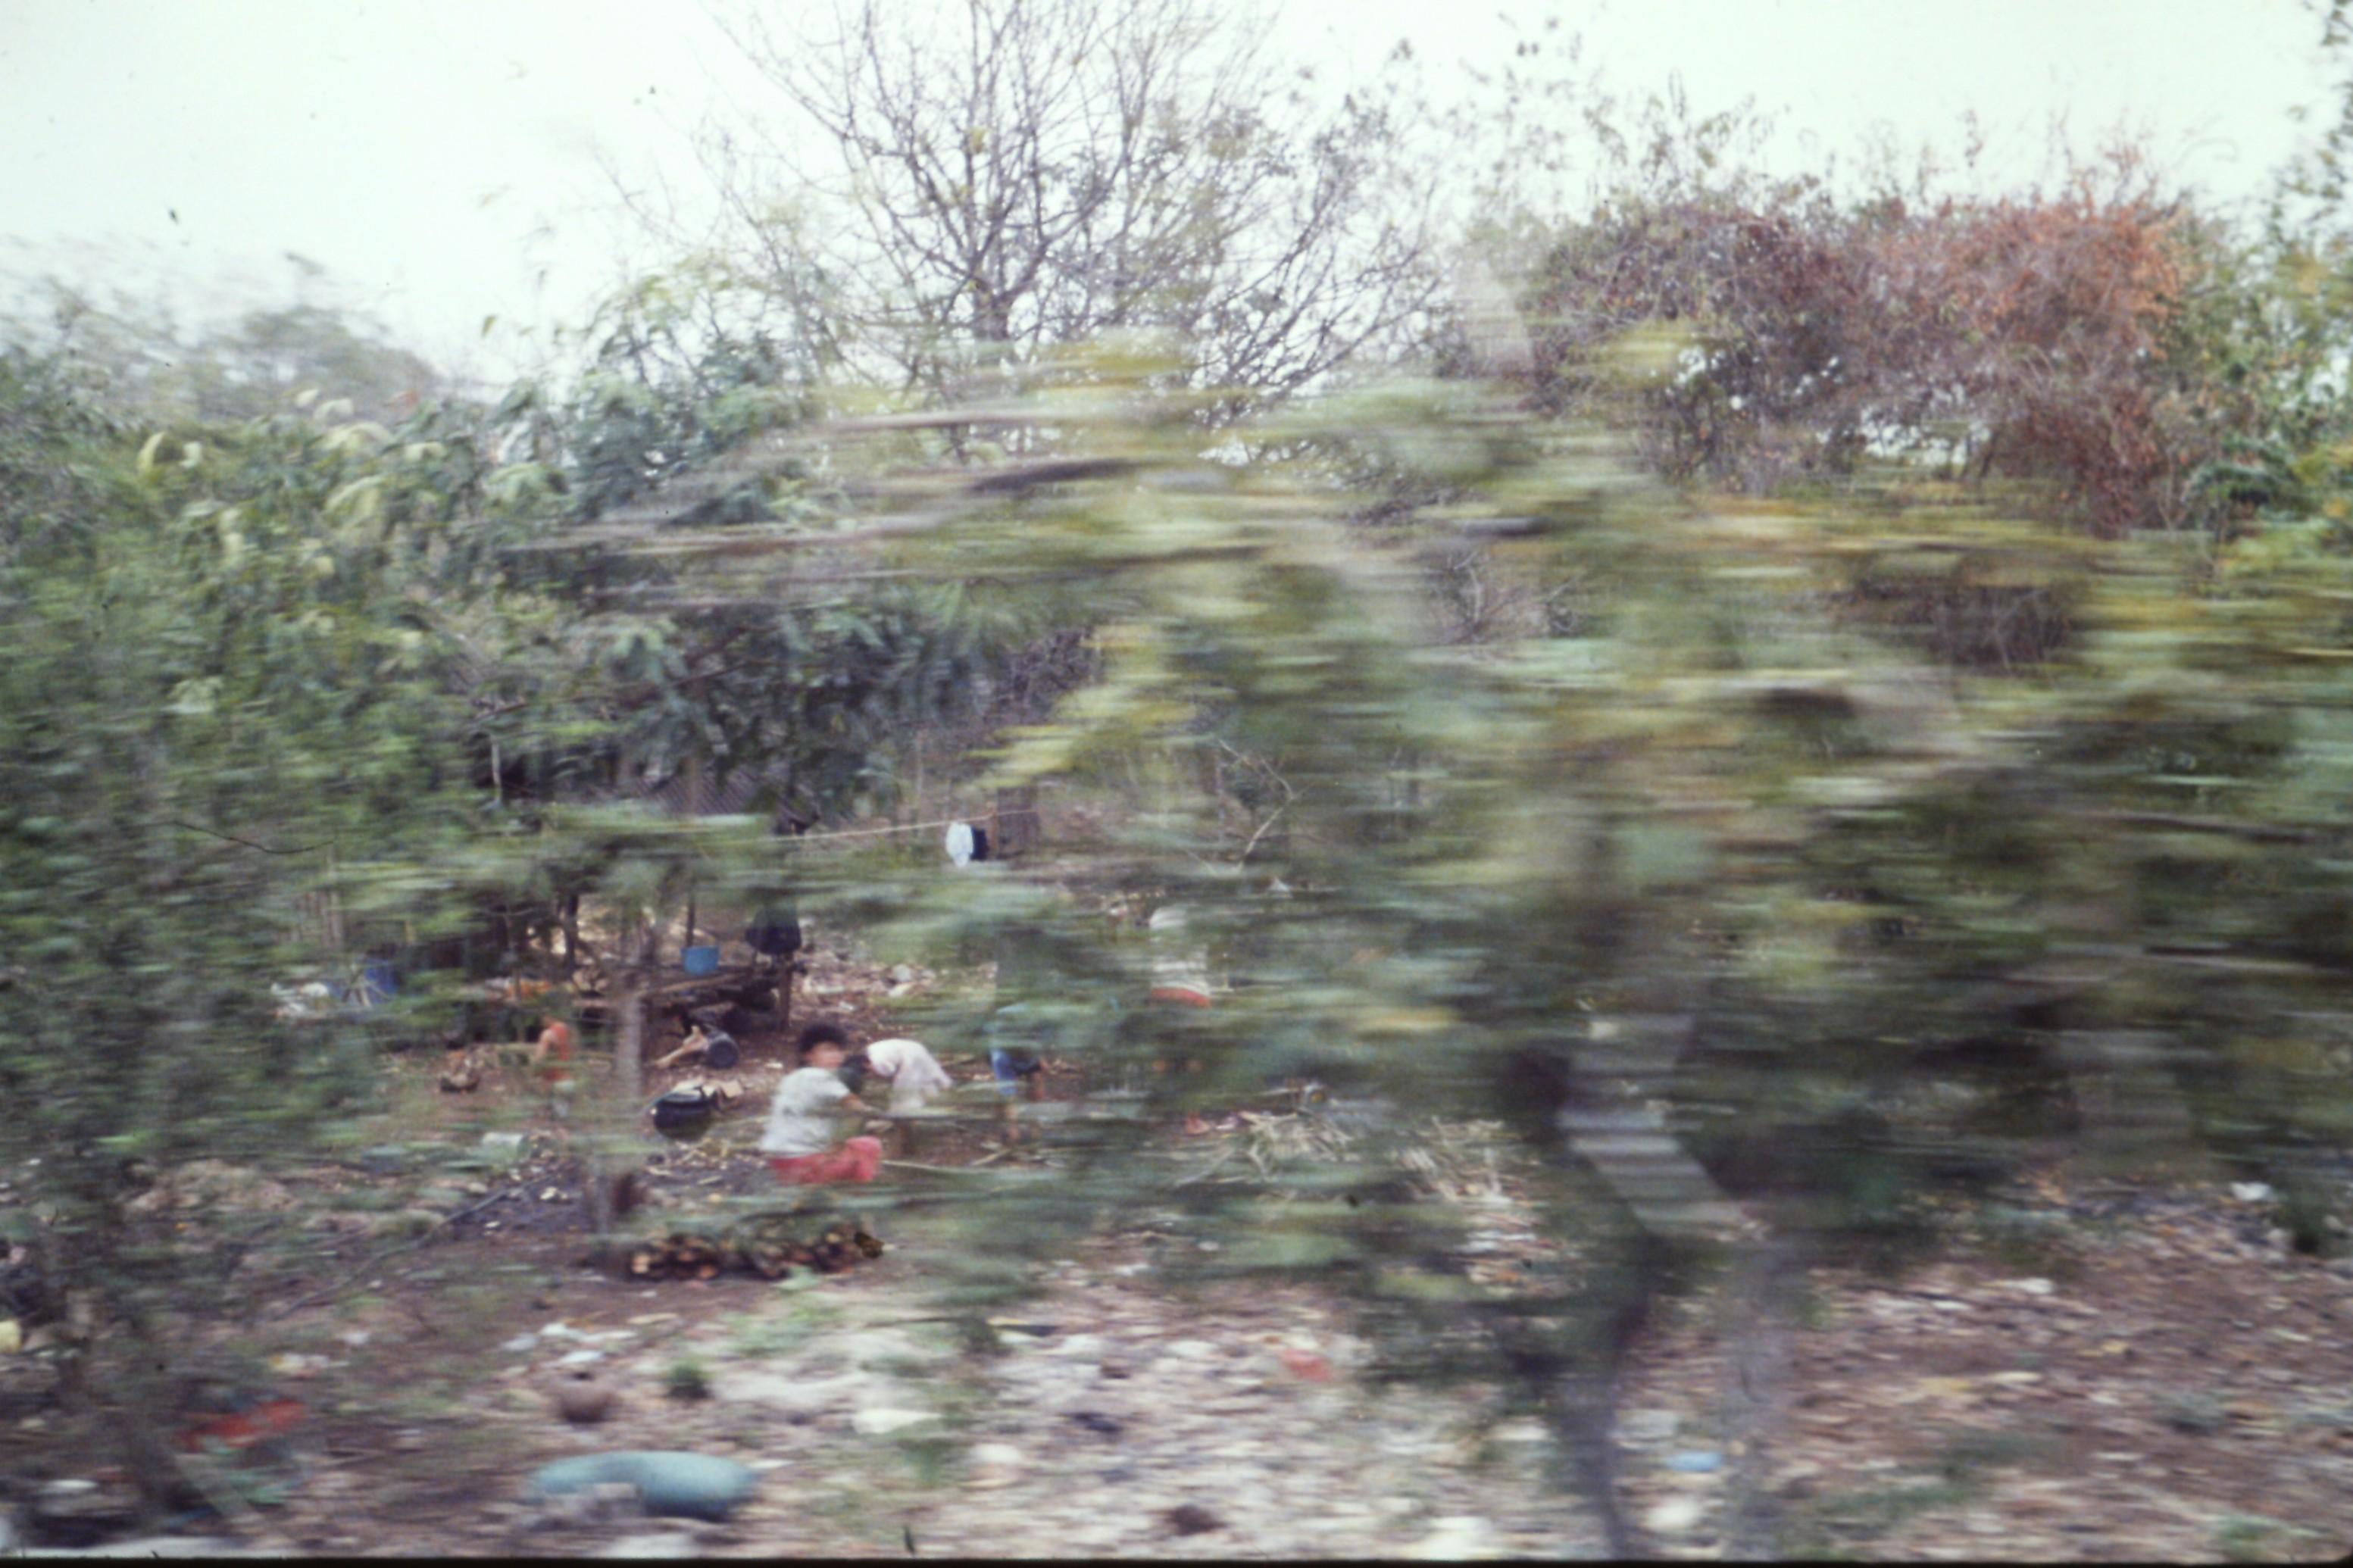 village blur a glimpse of life.JPG